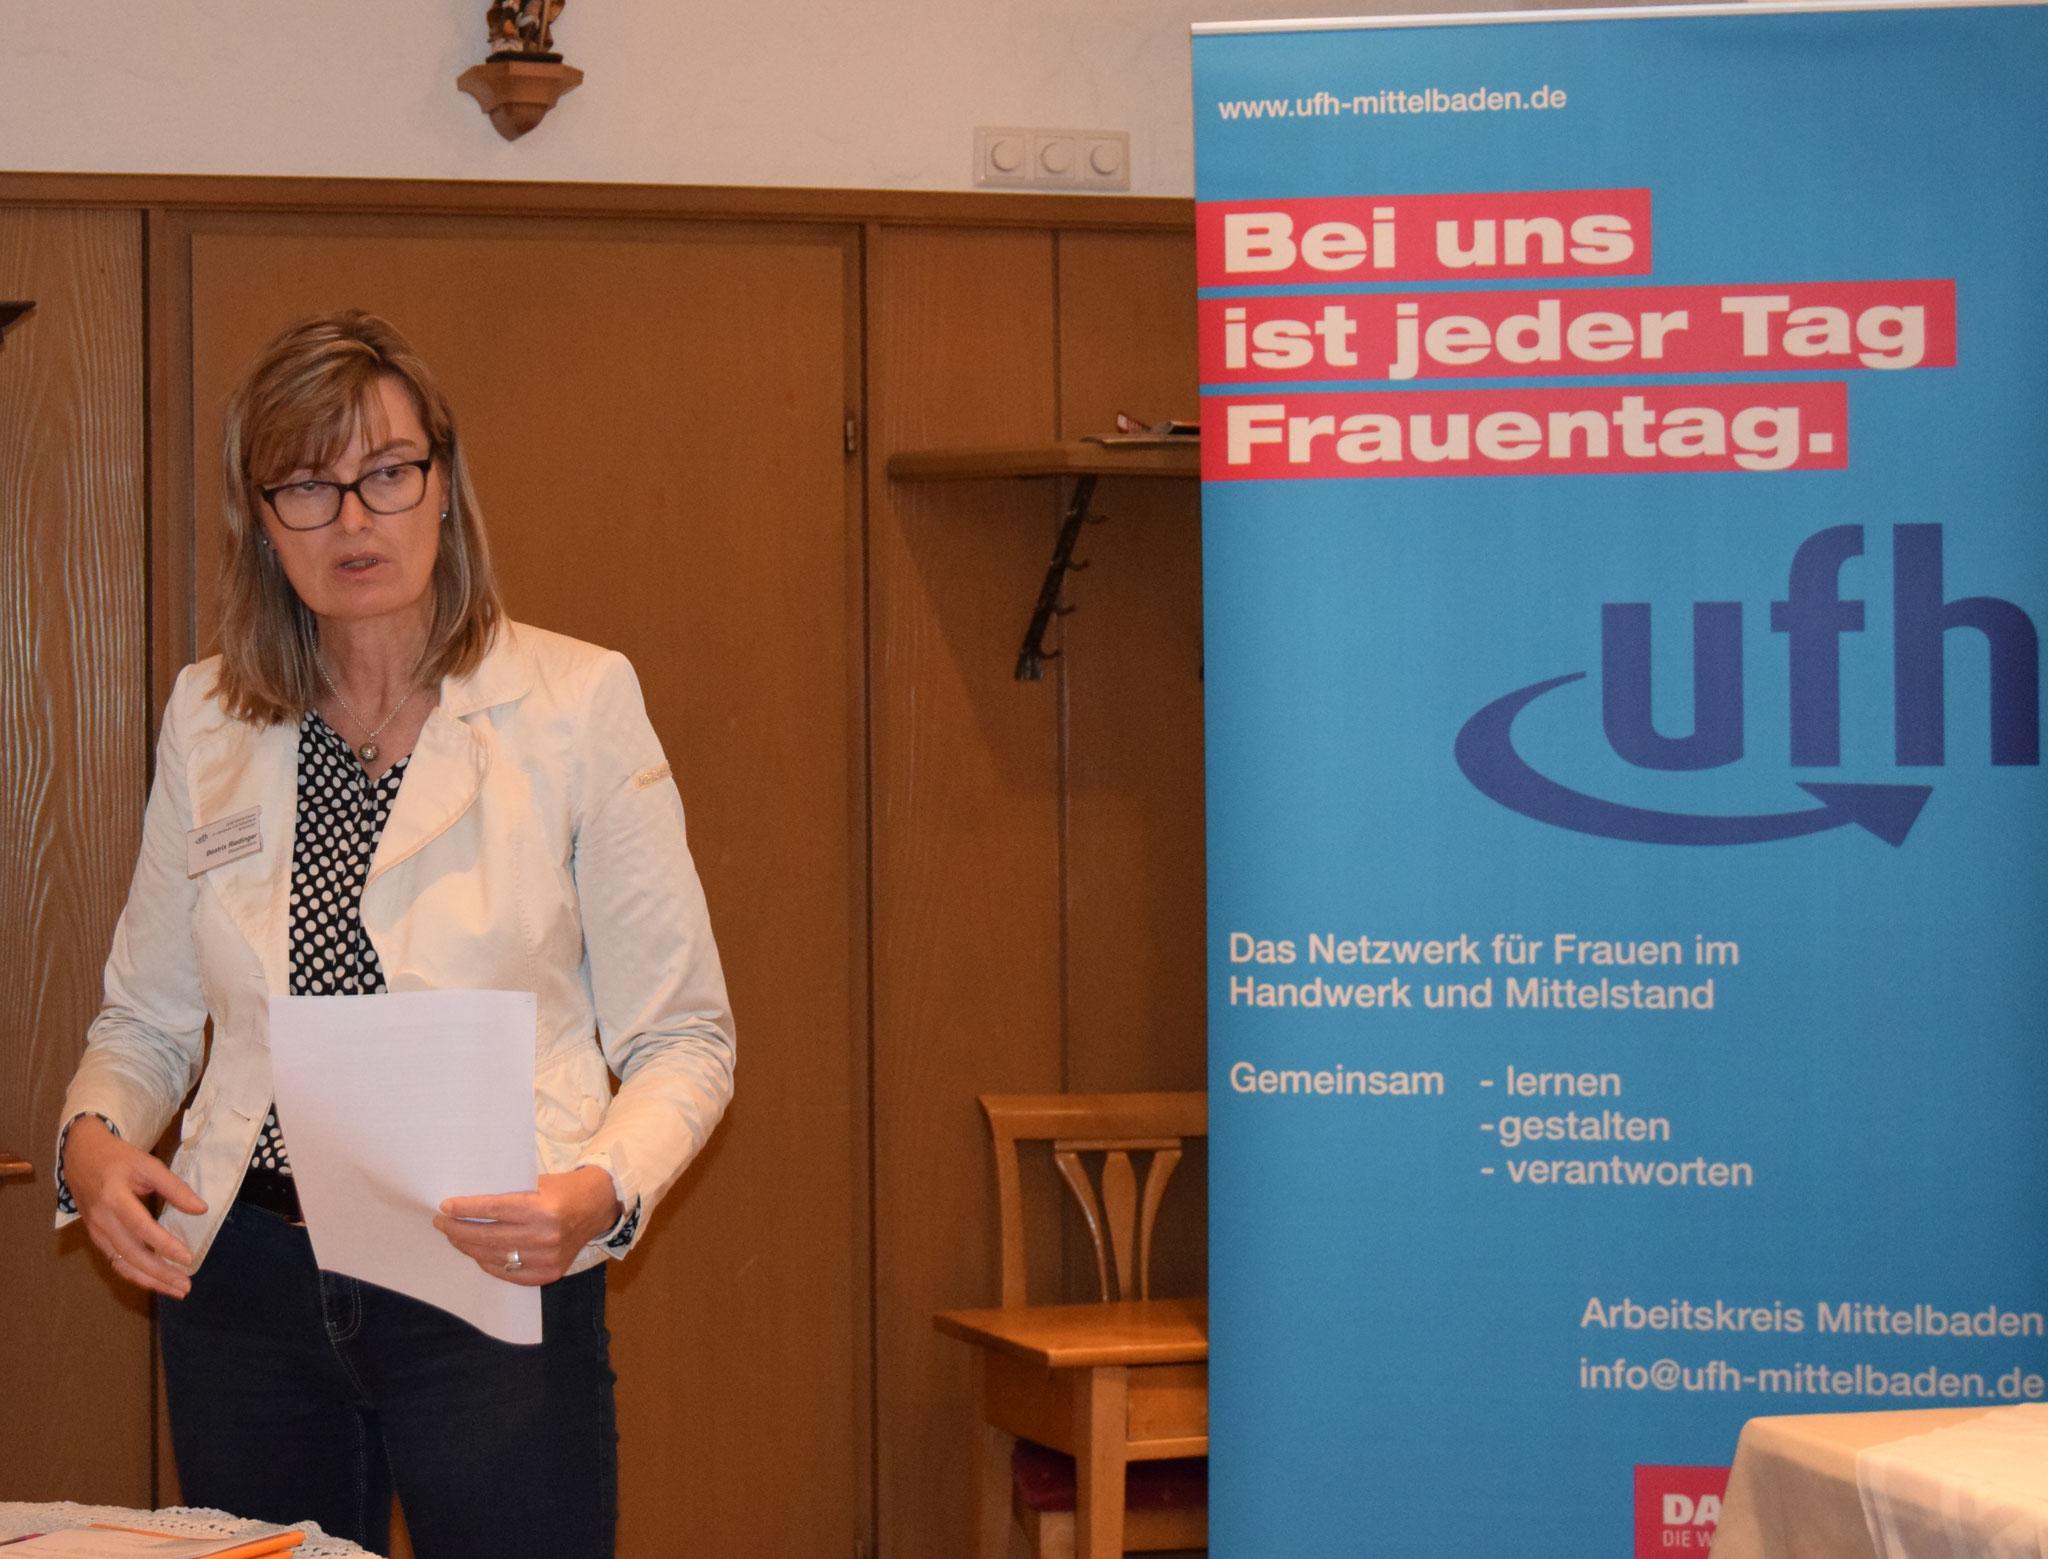 10-17 Aktuelles aus dem Steuerrecht mit Beatrix Riedinger